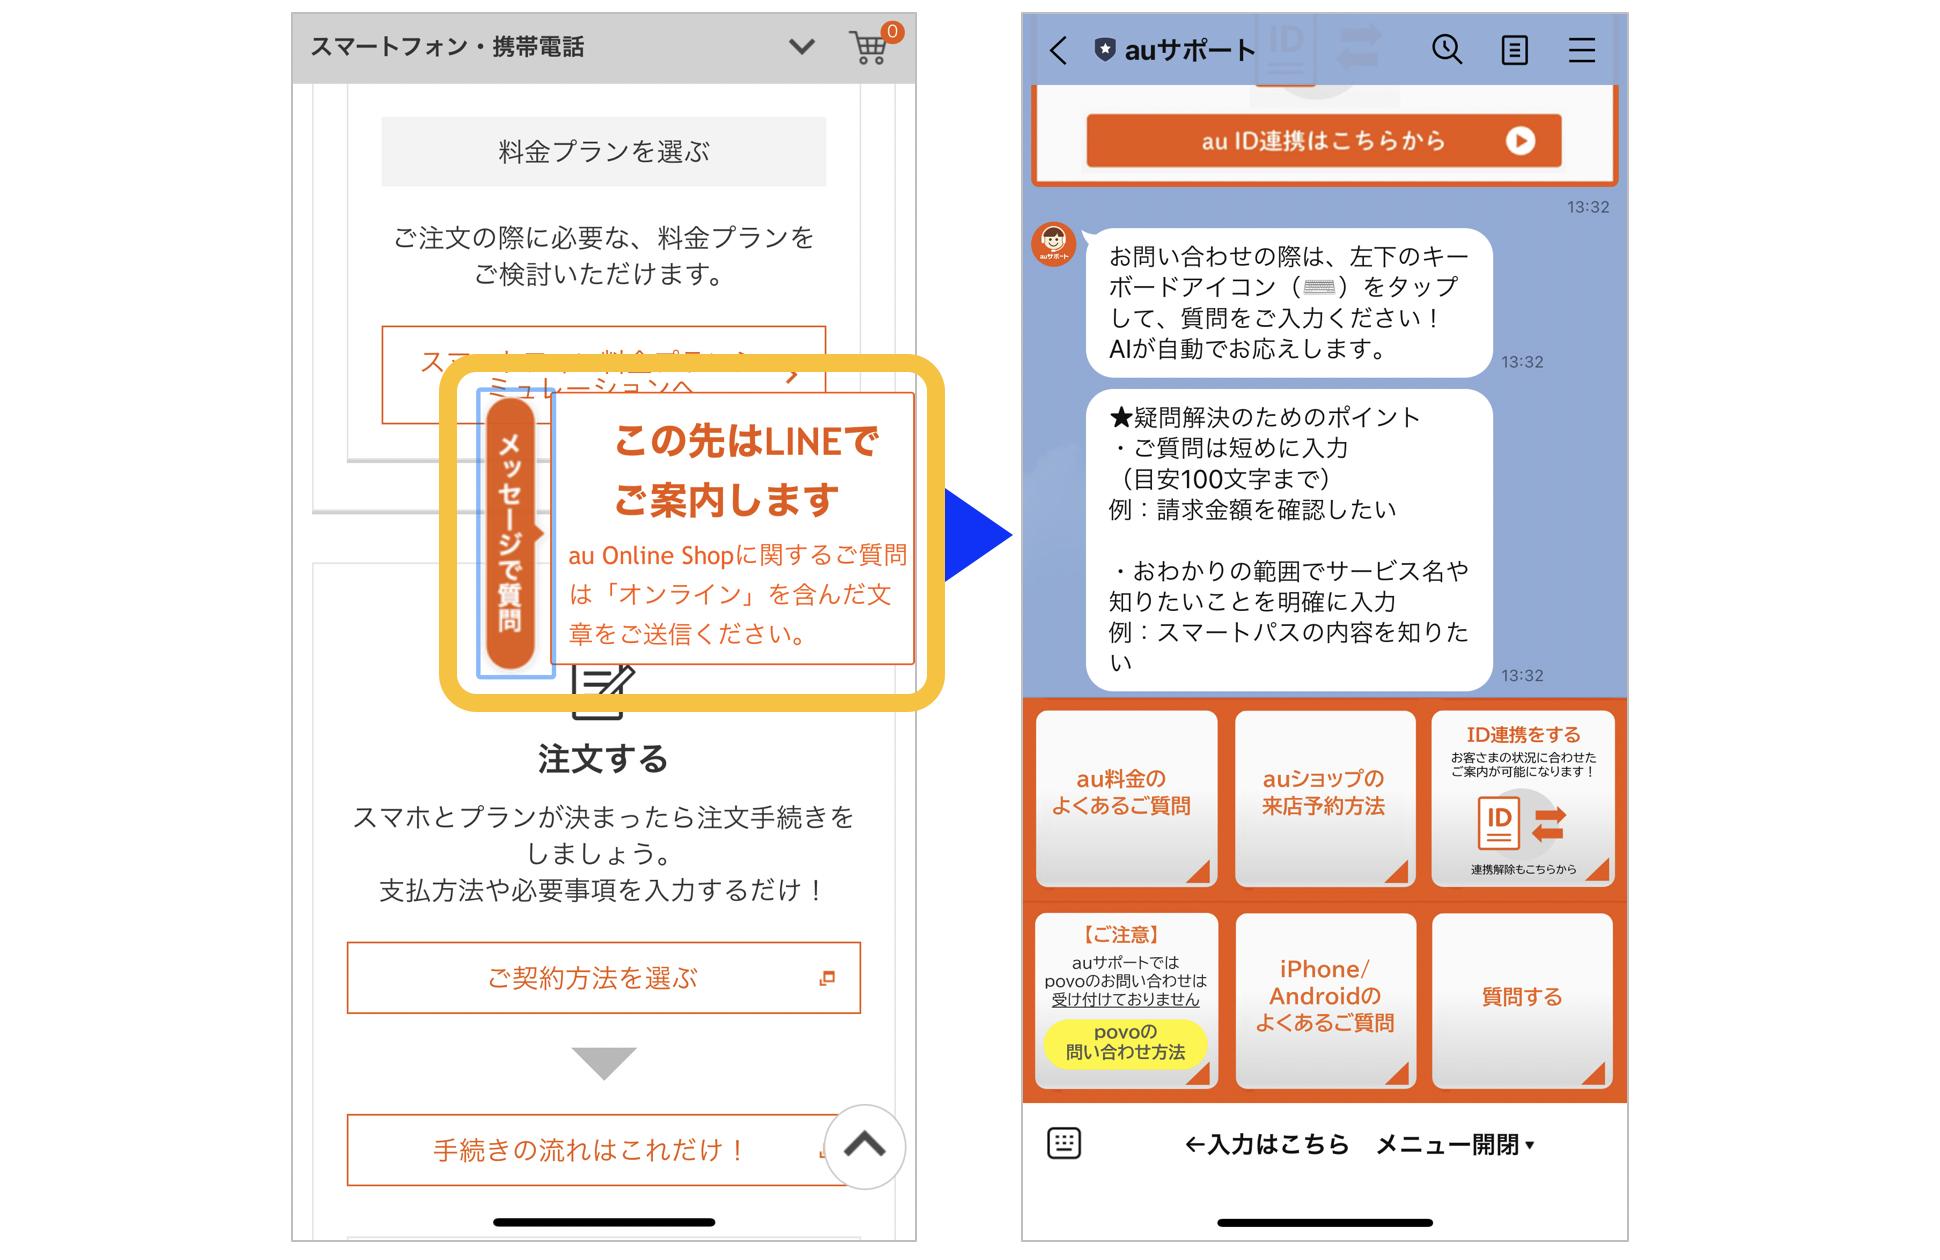 auのはじめてのオンラインショップ講座サイトのチャットメッセージによる質問画面